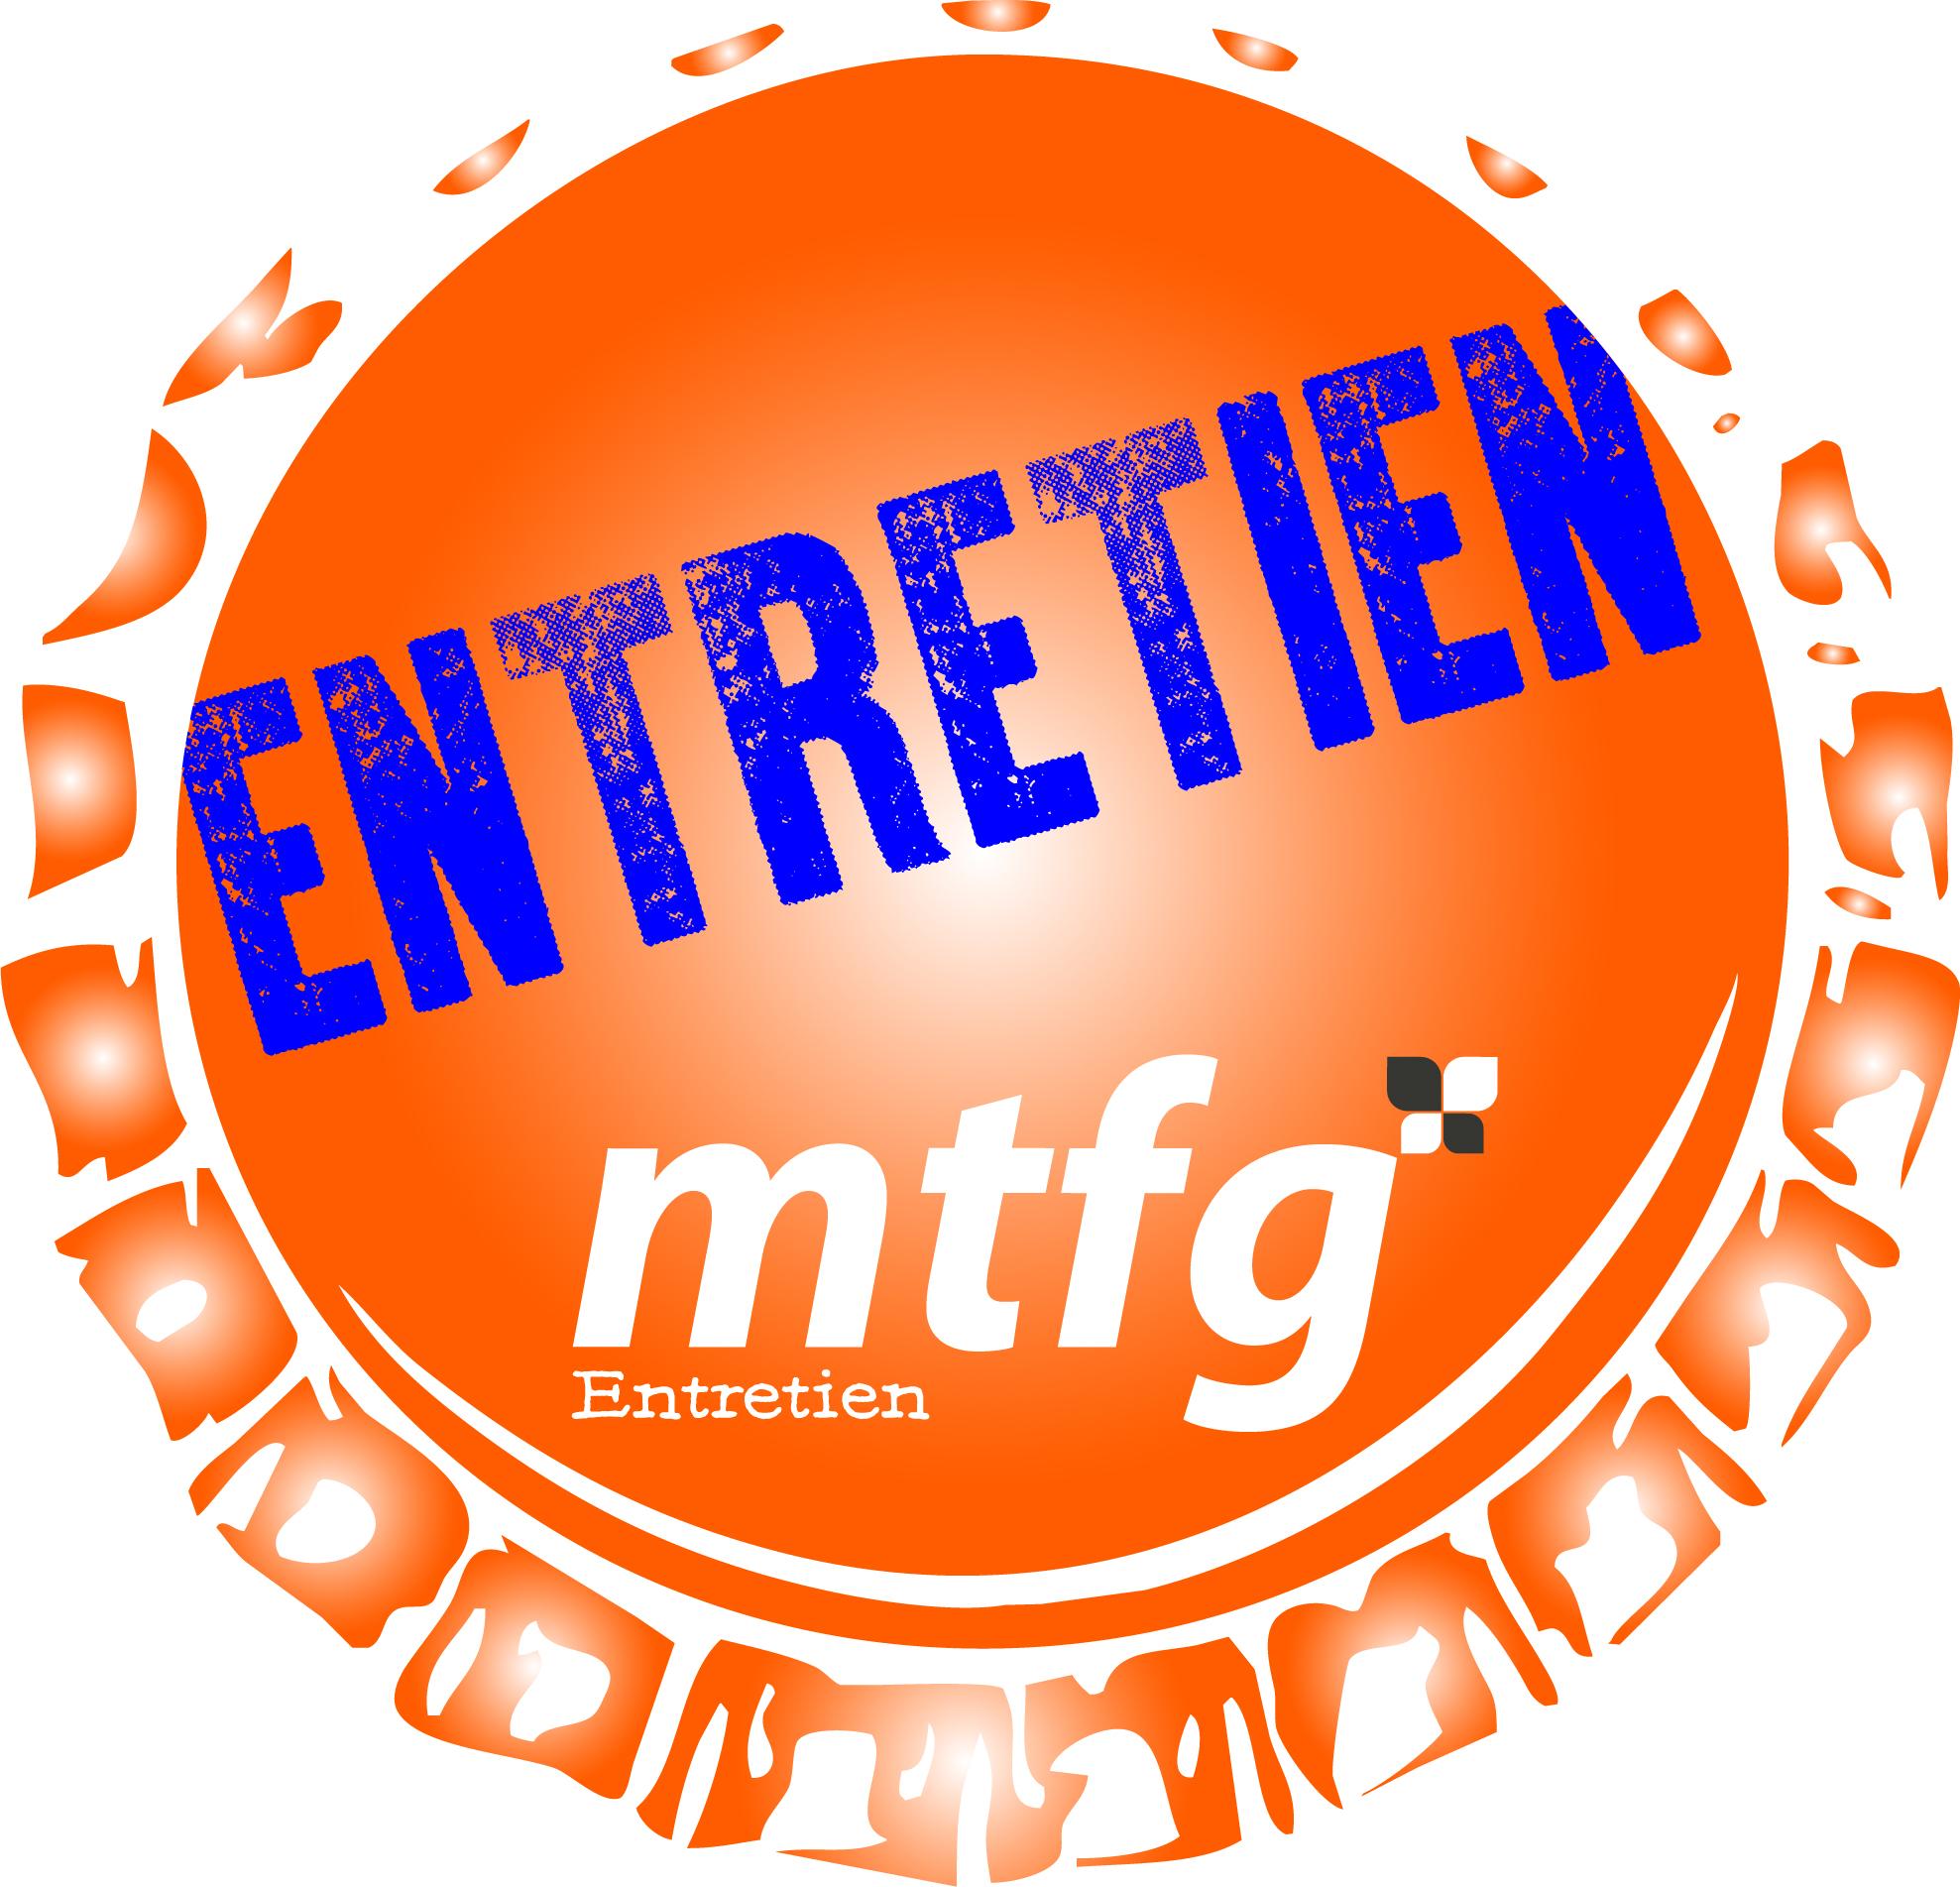 MTFG Entretien